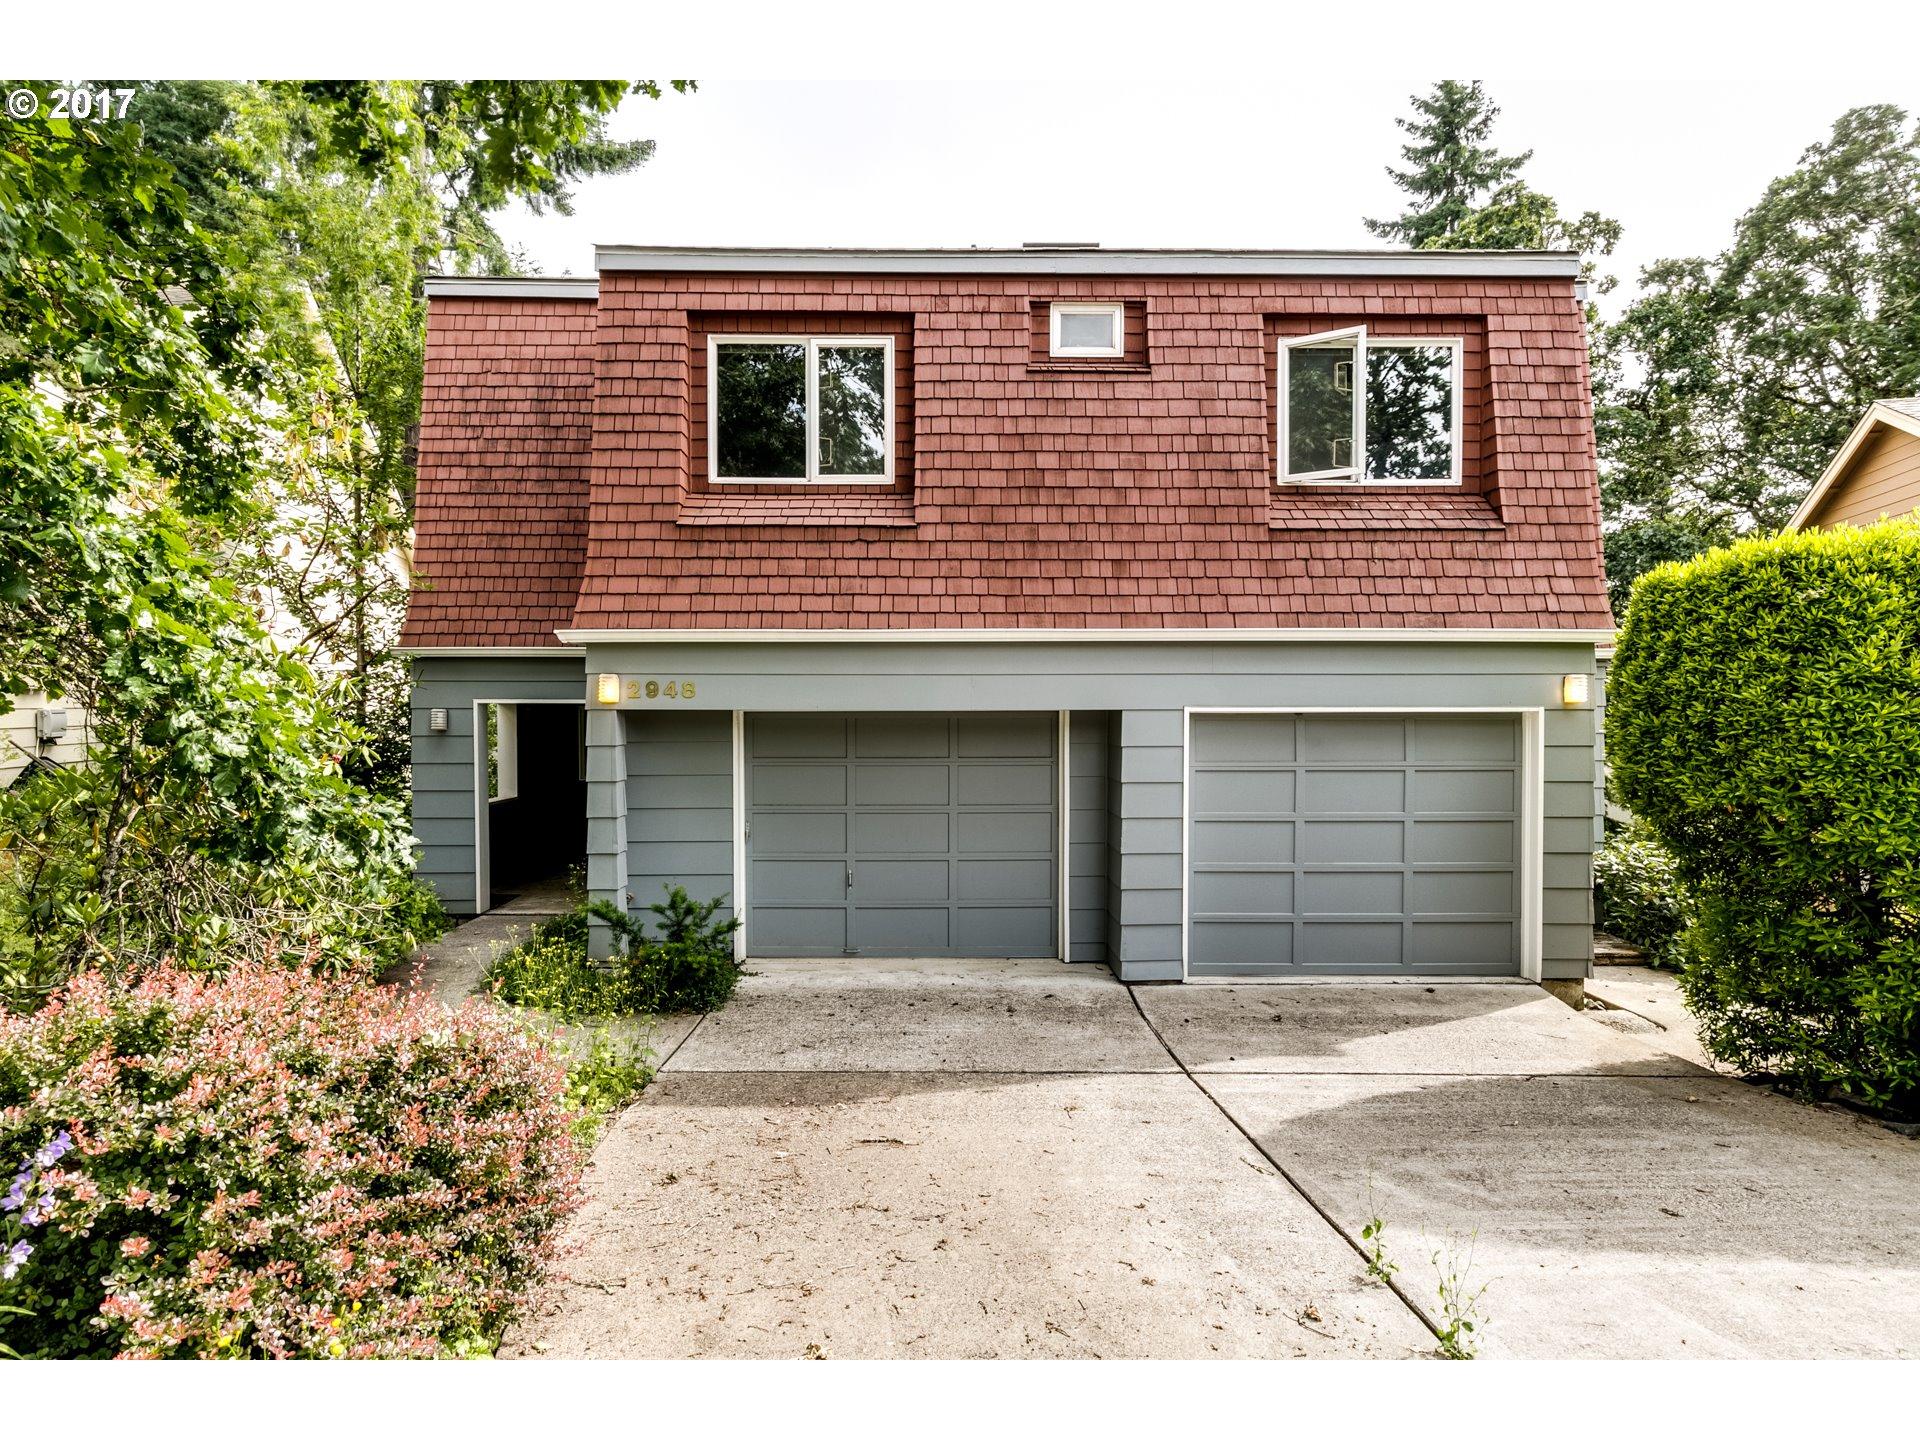 2948 CHANDLER AVE, Eugene, OR 97403